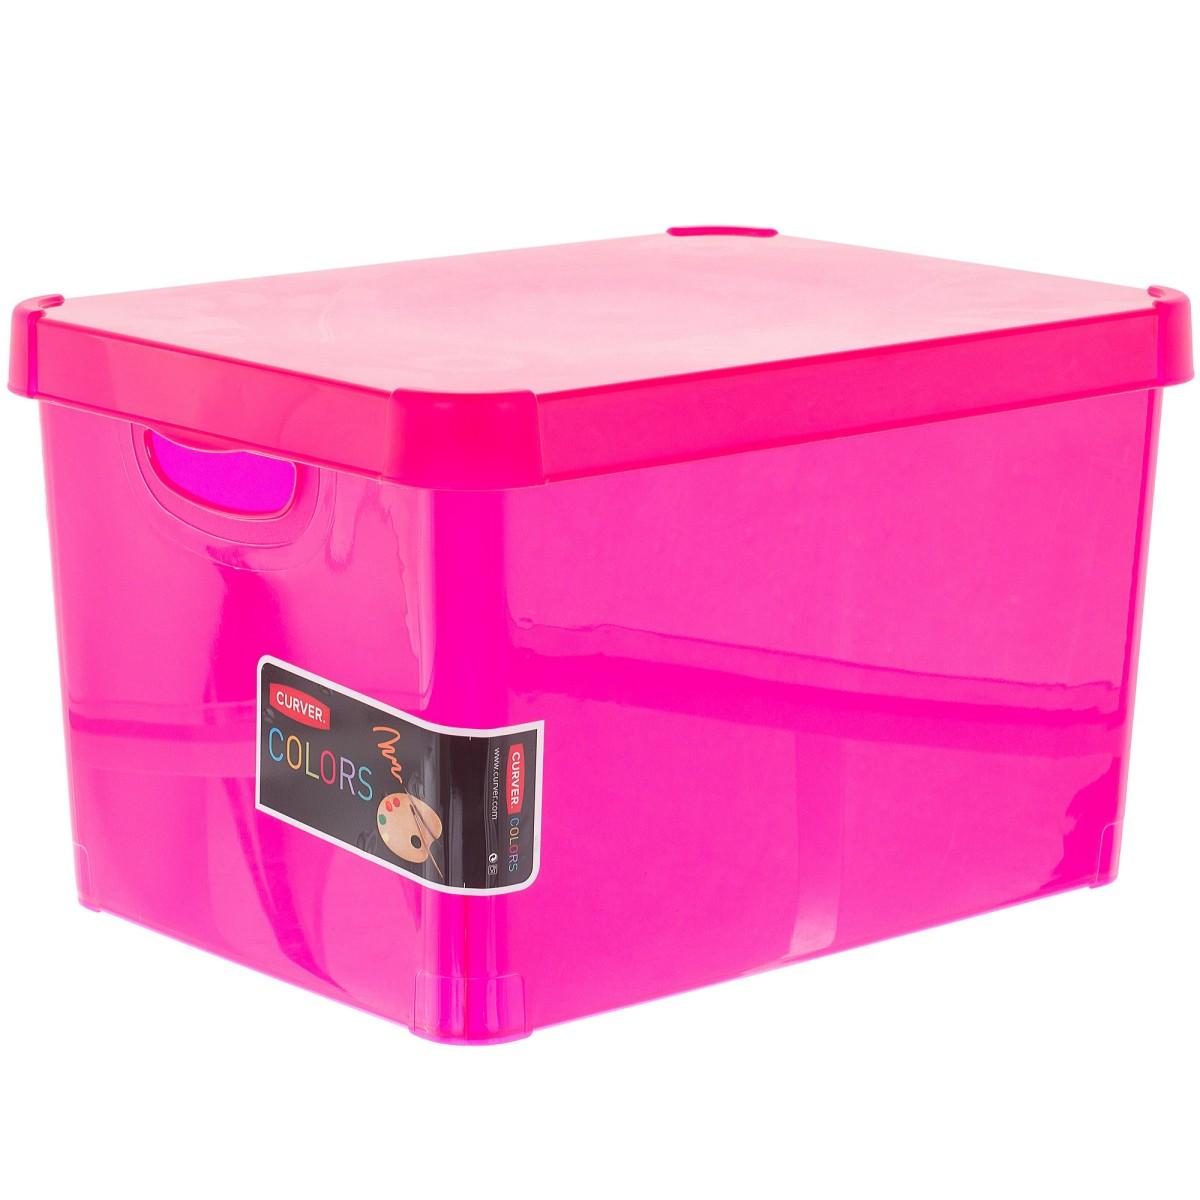 Коробка Curver Stockholm L пластик цвет розовый